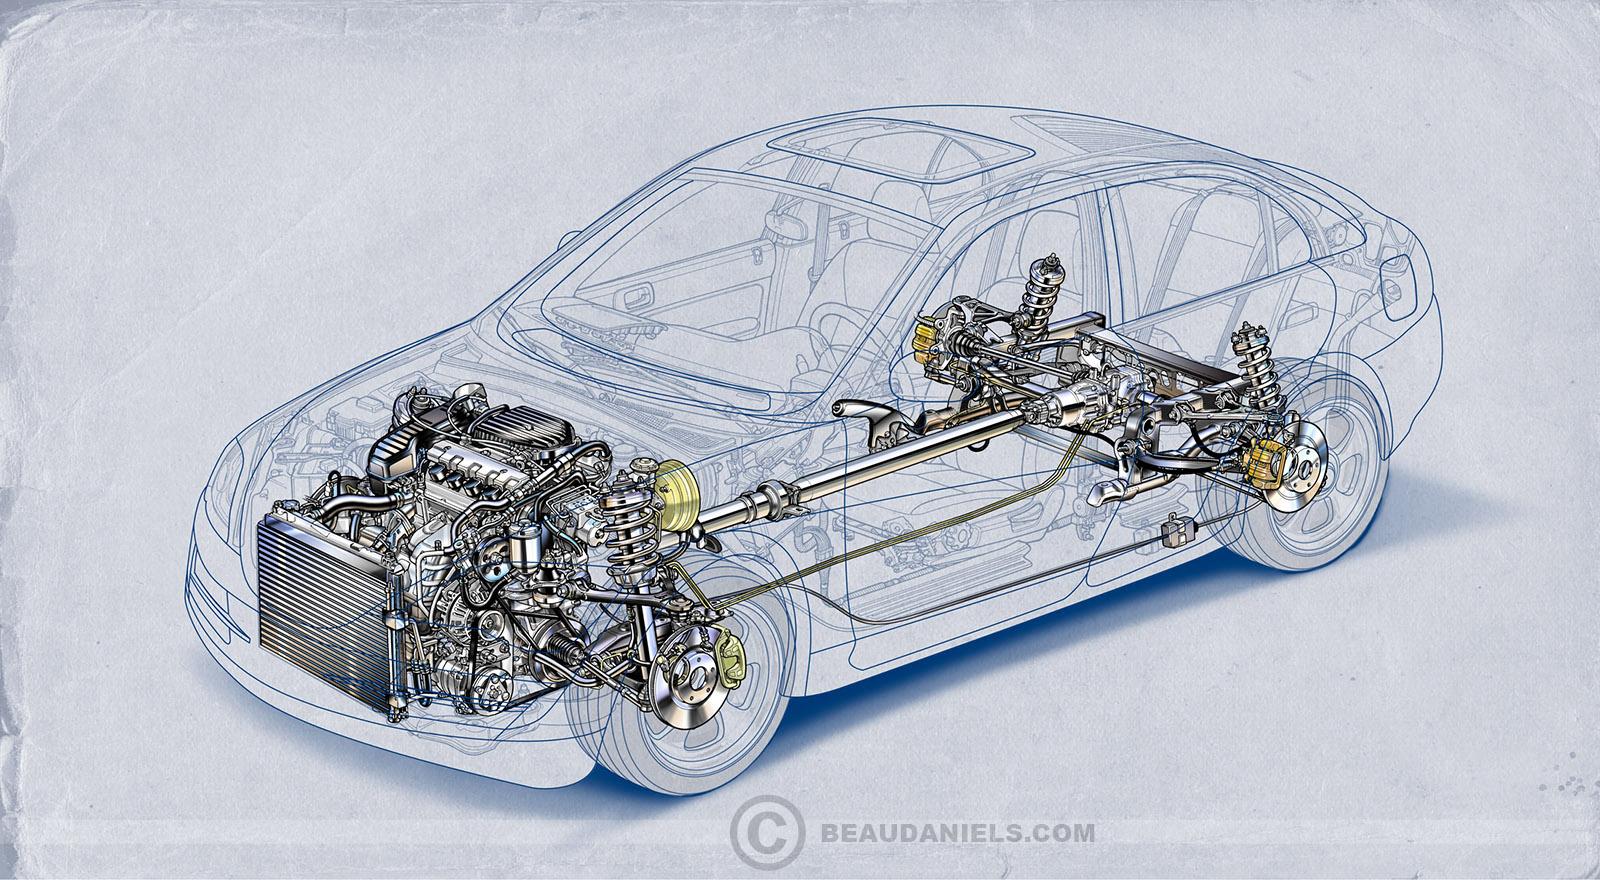 Generic Car Diagram All Kind Of Wiring Diagrams Auto Stock Vehicle Illustrations Portfolio 2 On Behance Rh Net Clip Art Bill